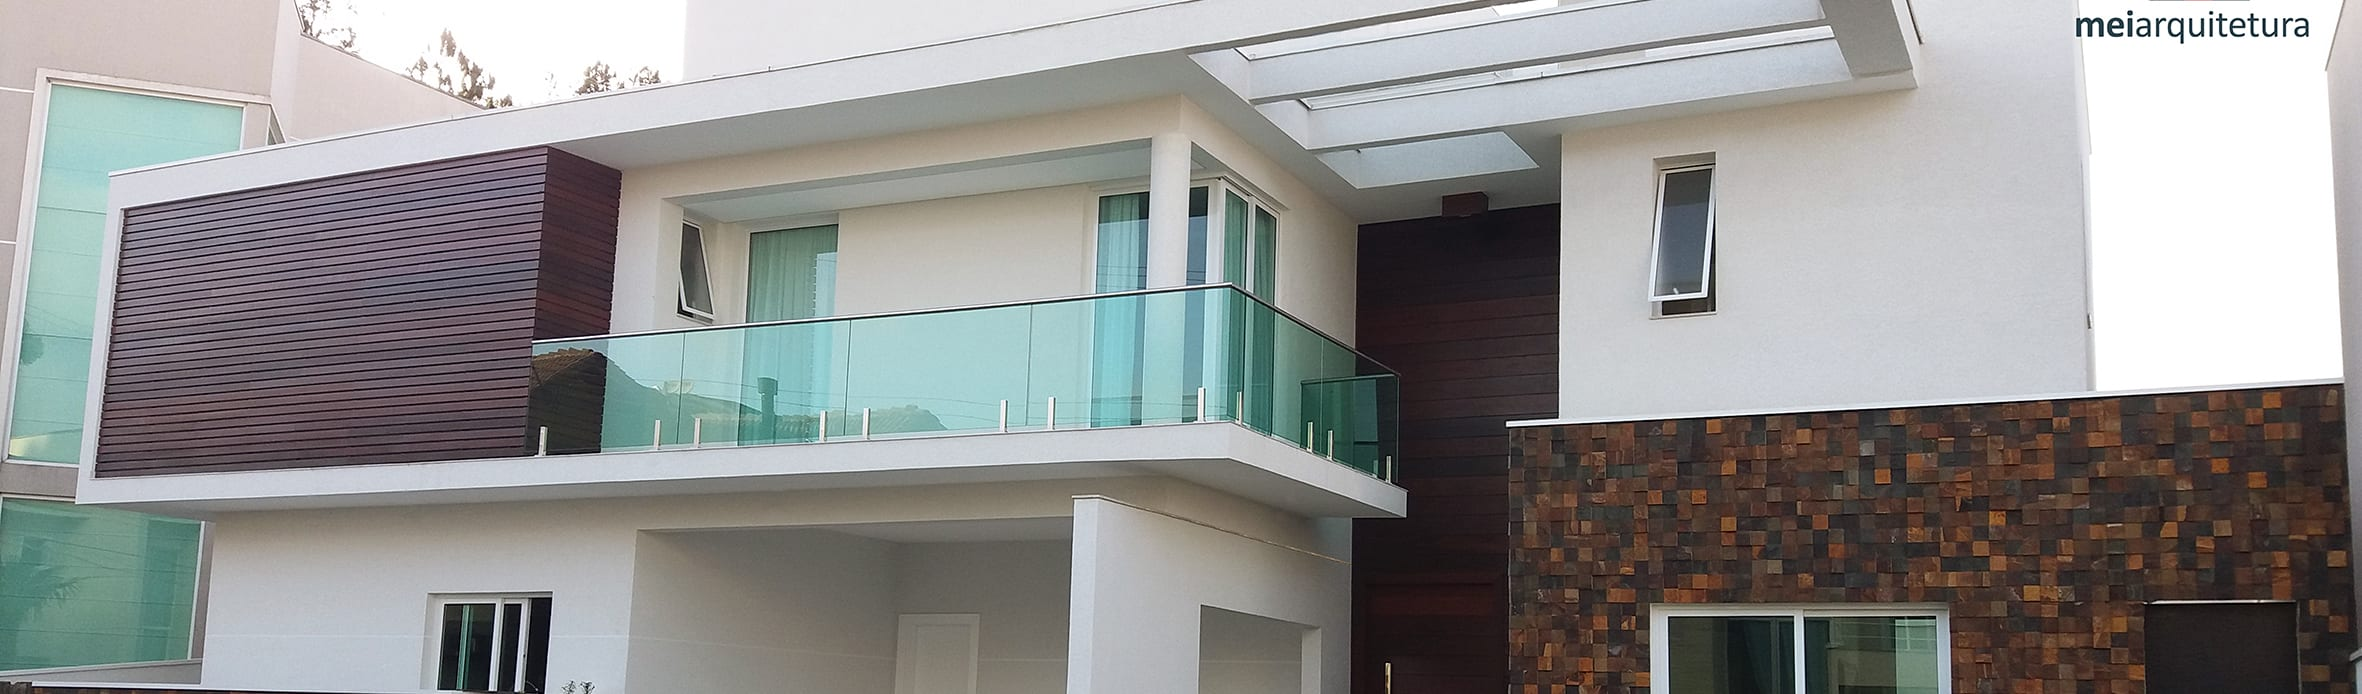 MEI Arquitetura e Interiores